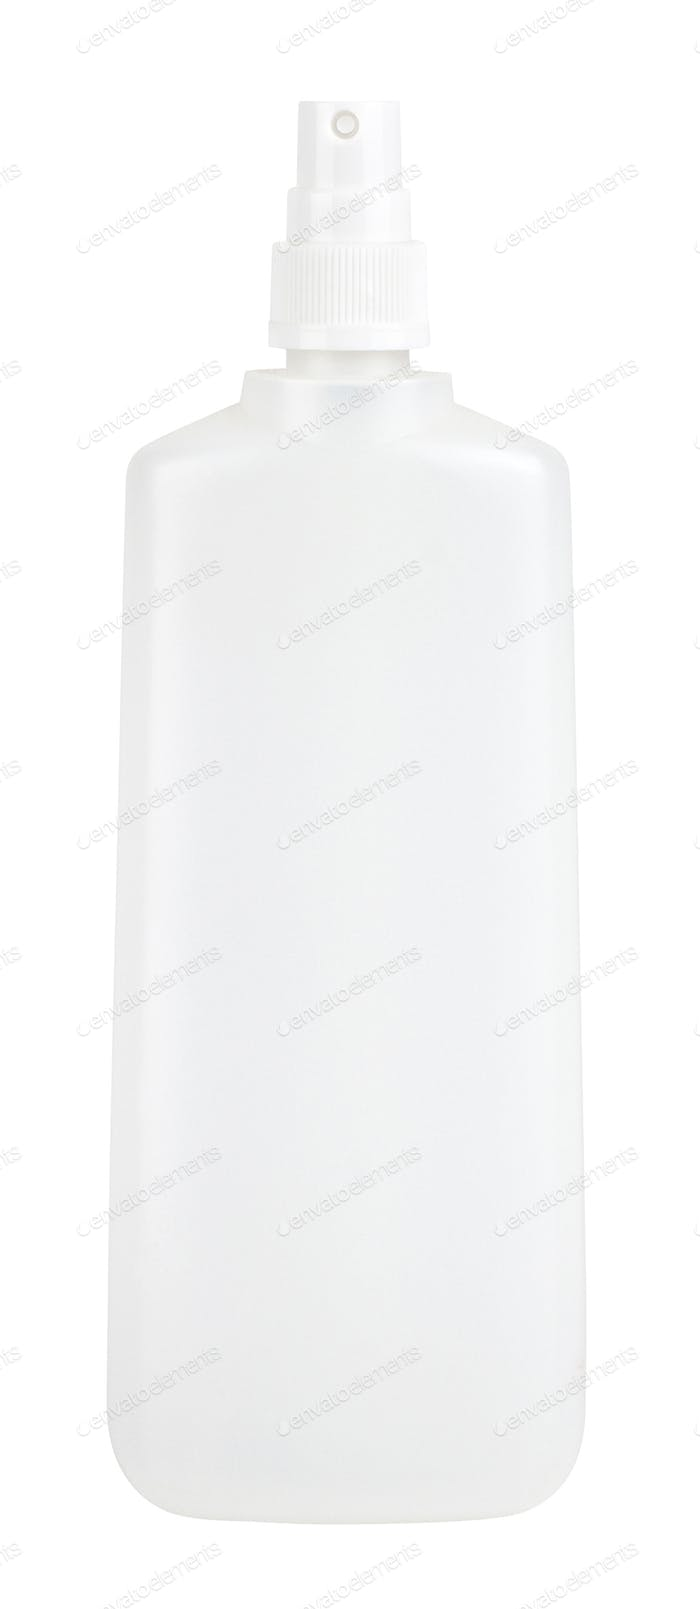 Blank White Tube